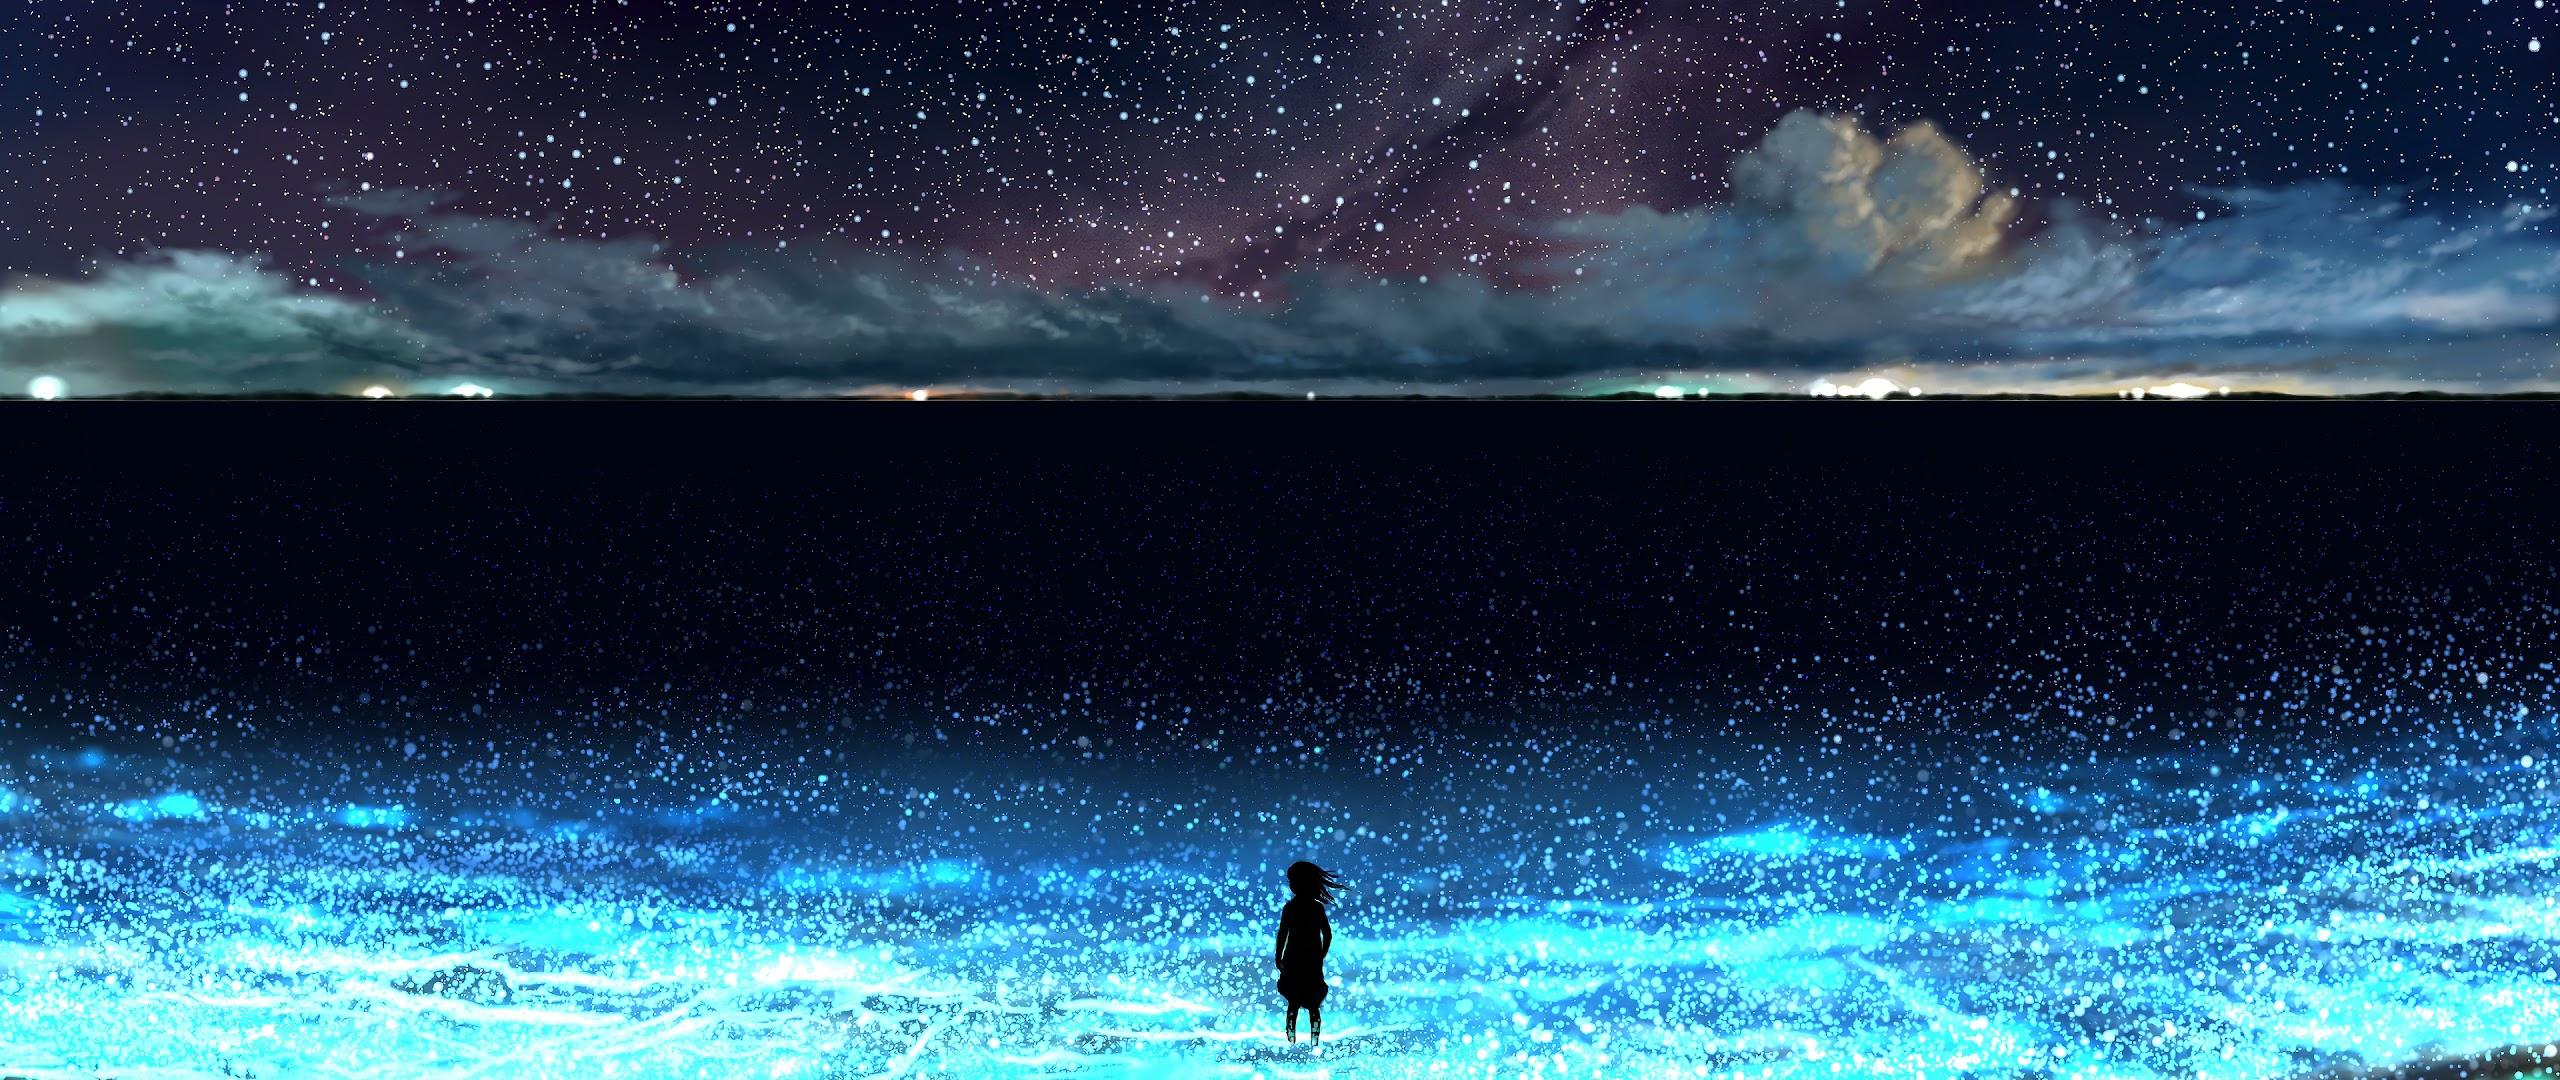 Anime Night Sky Stars Beach Scenery 4k Wallpaper 88